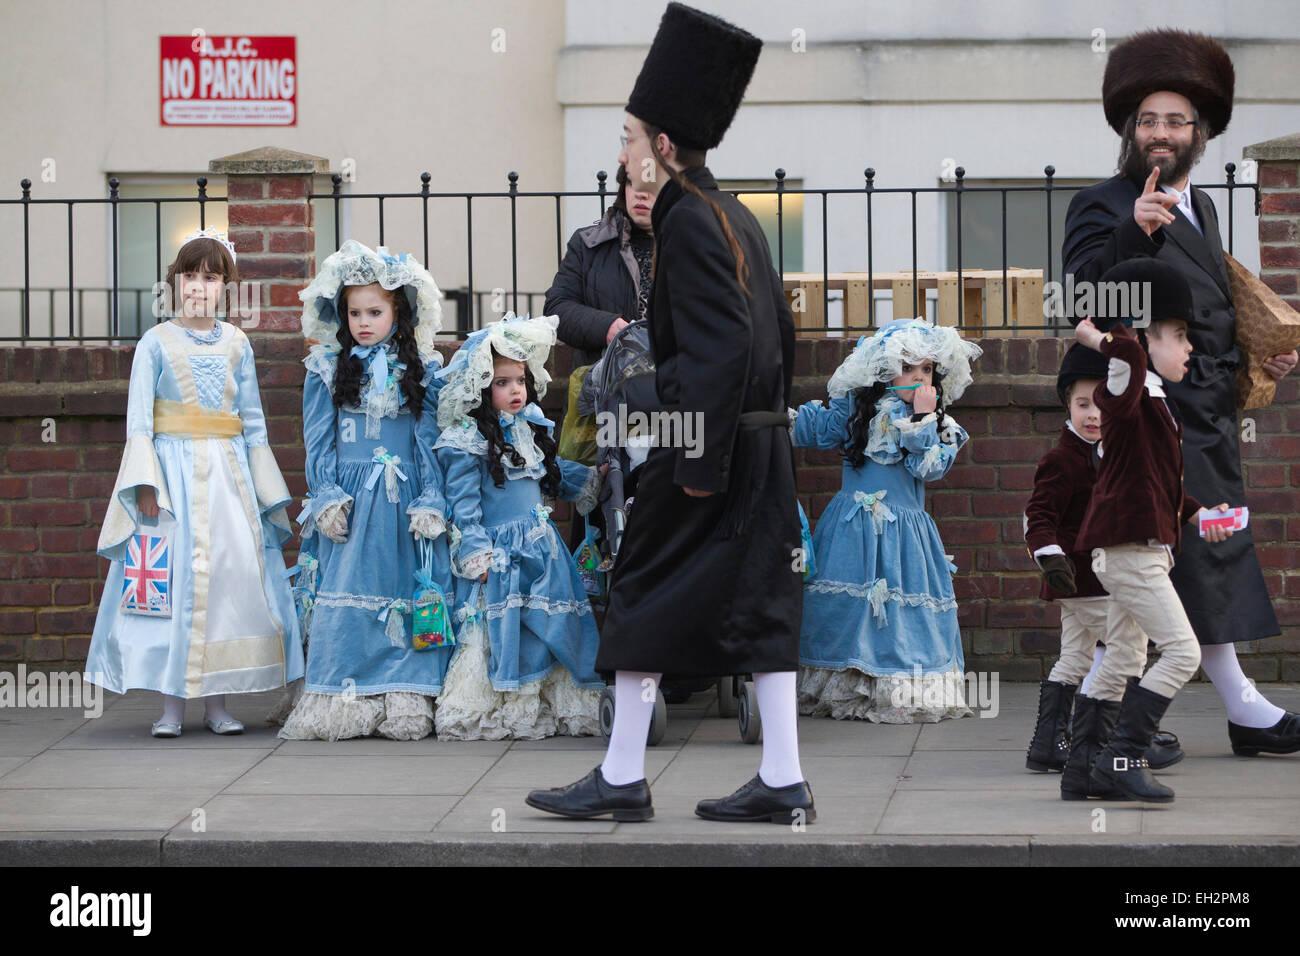 Stamford Hill, London, UK. 5th March, 2015. Jewish Purim Festival celebrations in Stamford Hill, North London, UK - Stock Image